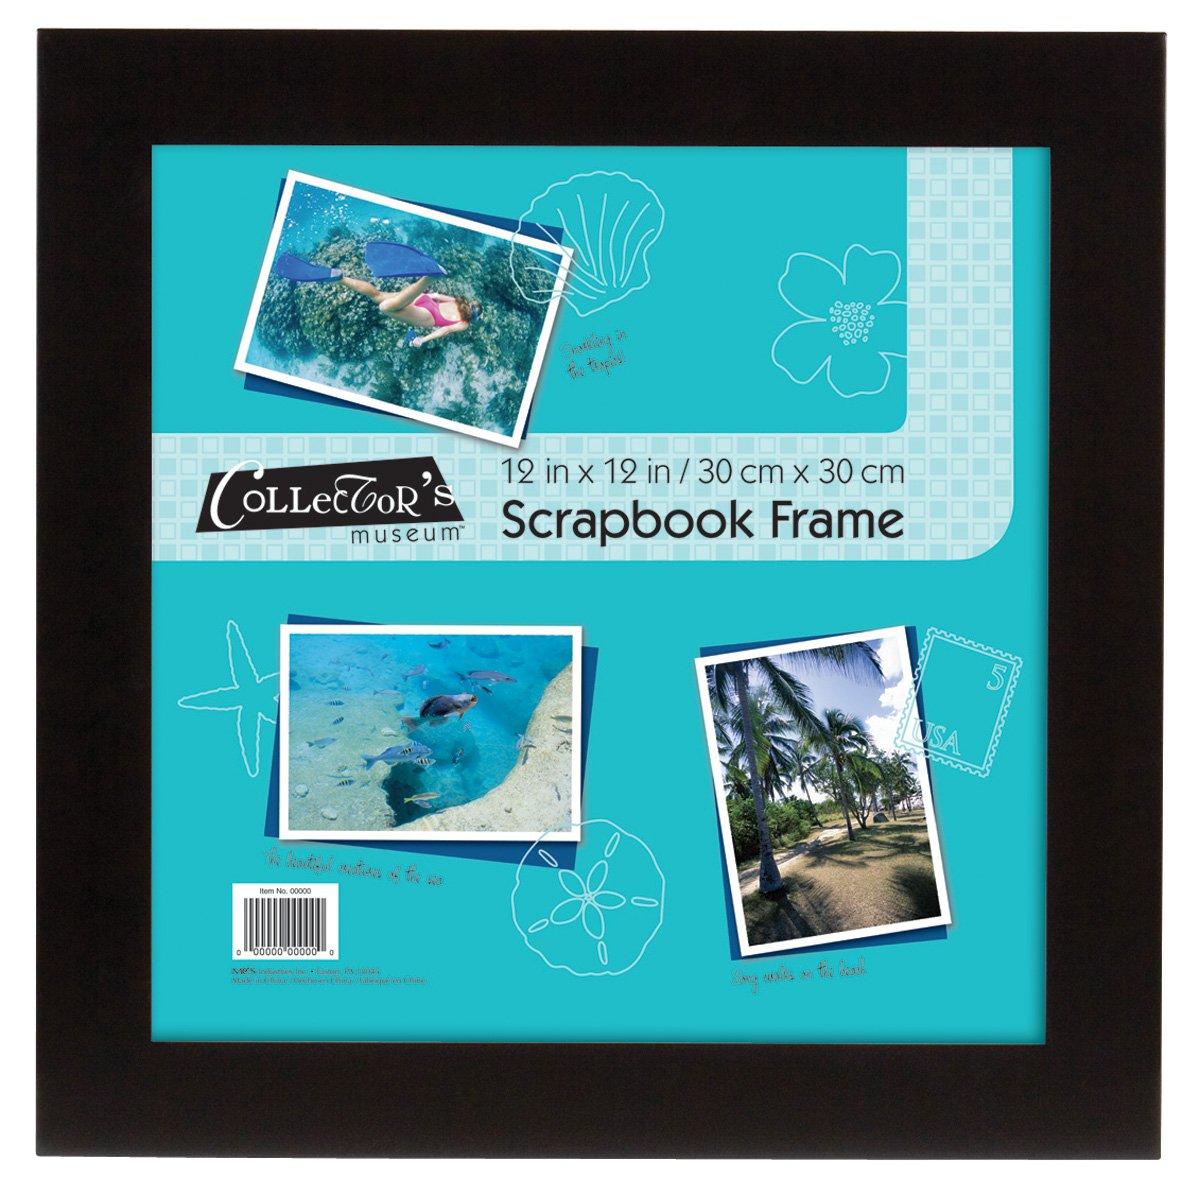 Amazon mcs 15x15 inch flat scrapbook frame with 12x12 amazon mcs 15x15 inch flat scrapbook frame with 12x12 inserts black 40952 jeuxipadfo Choice Image